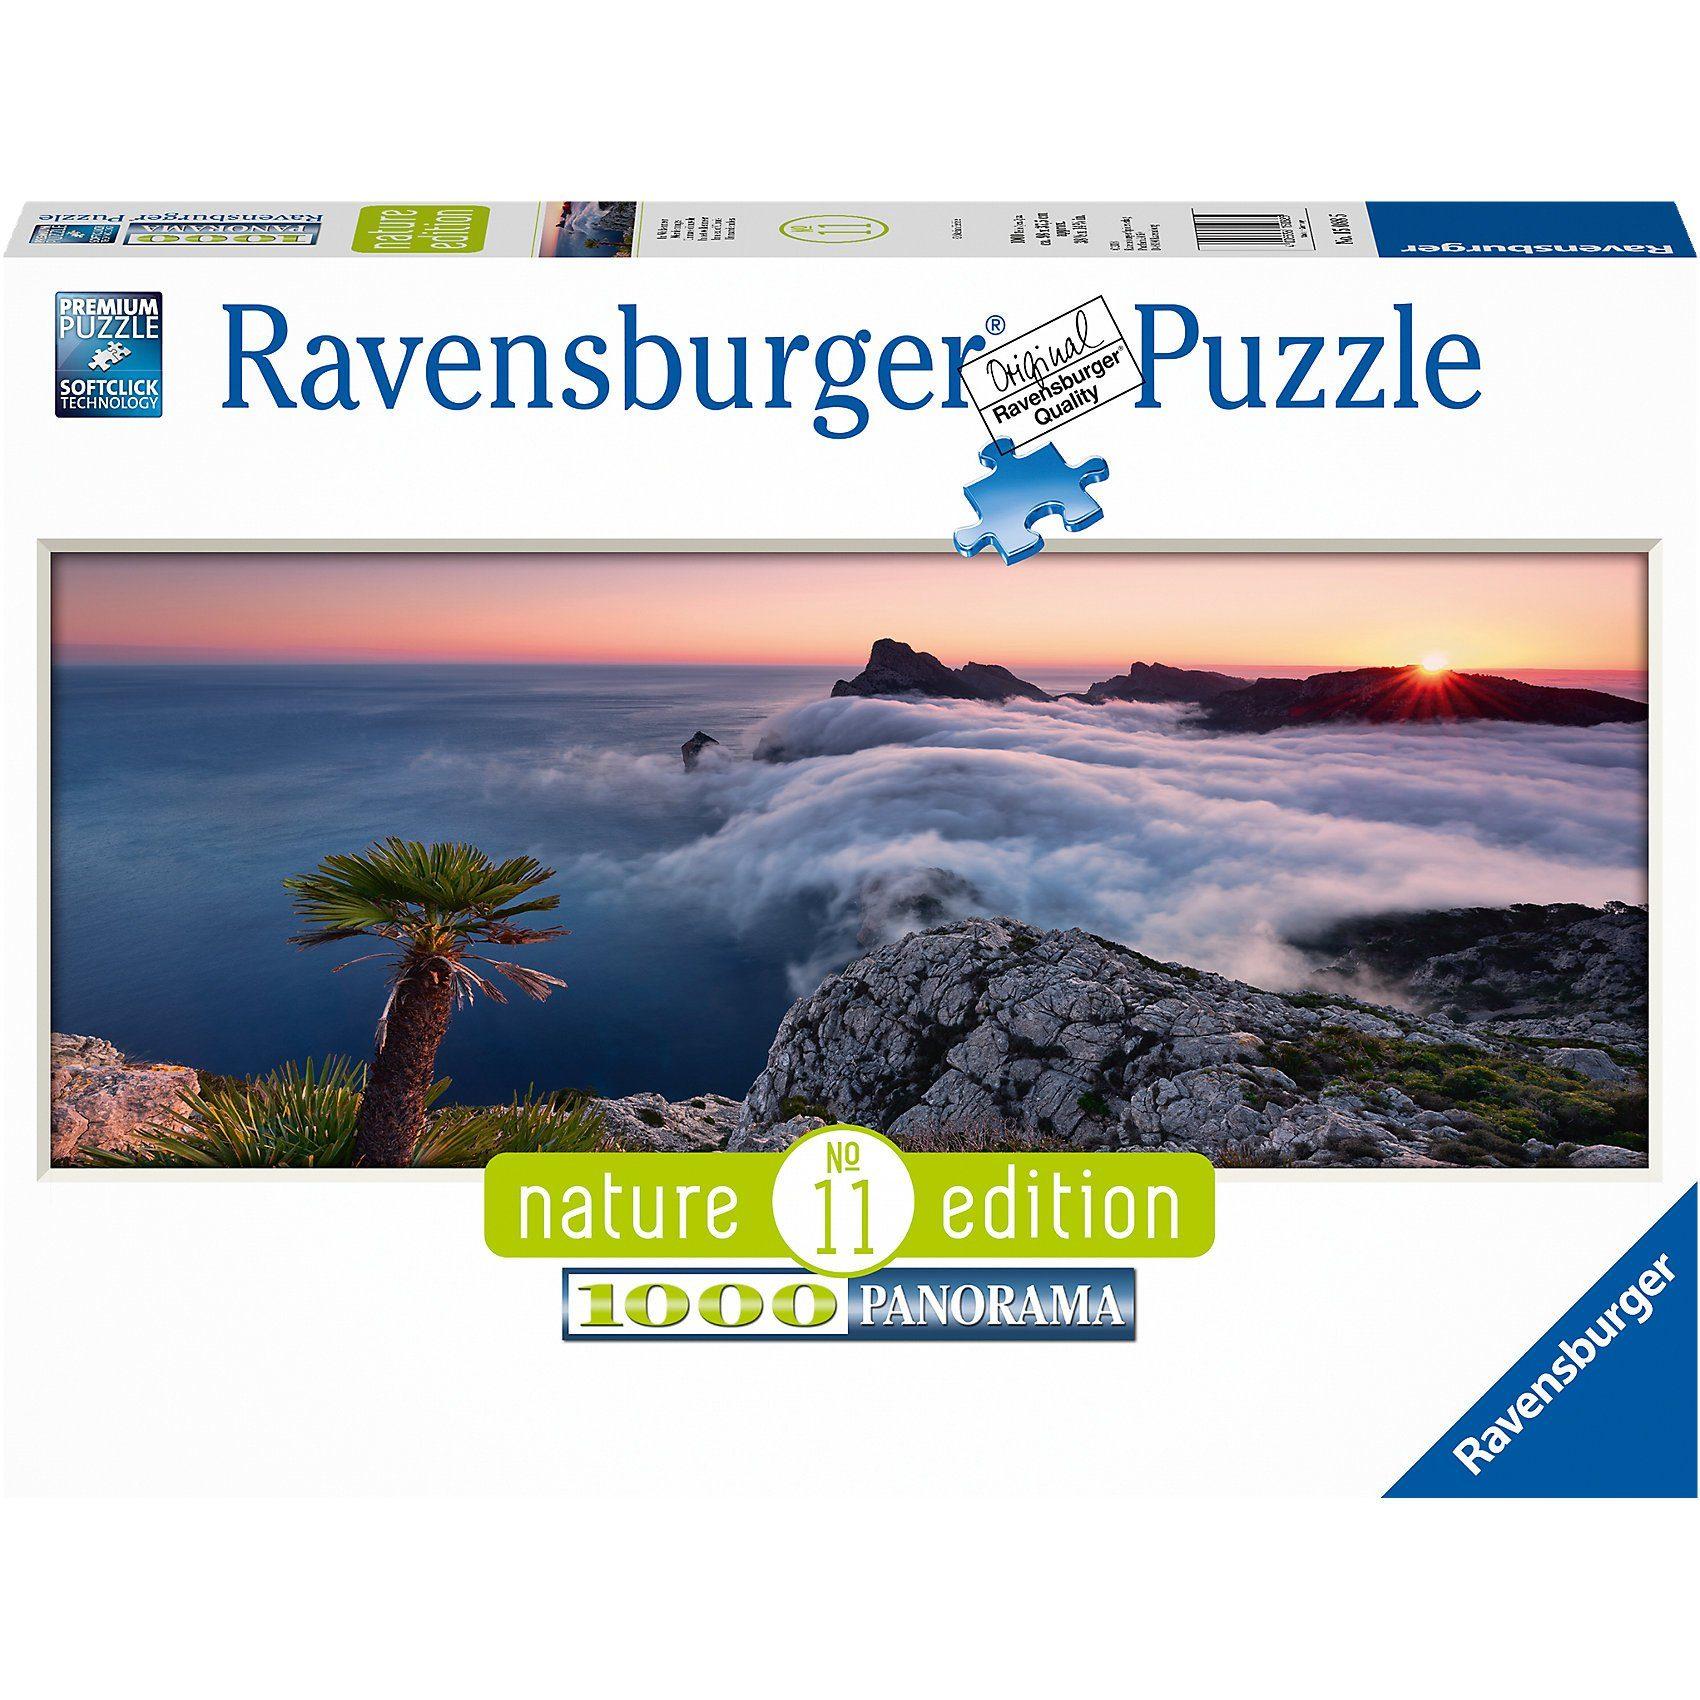 Ravensburger Puzzle 1000 Teile, 98x37 cm, Panorama, Im Wolkenmeer